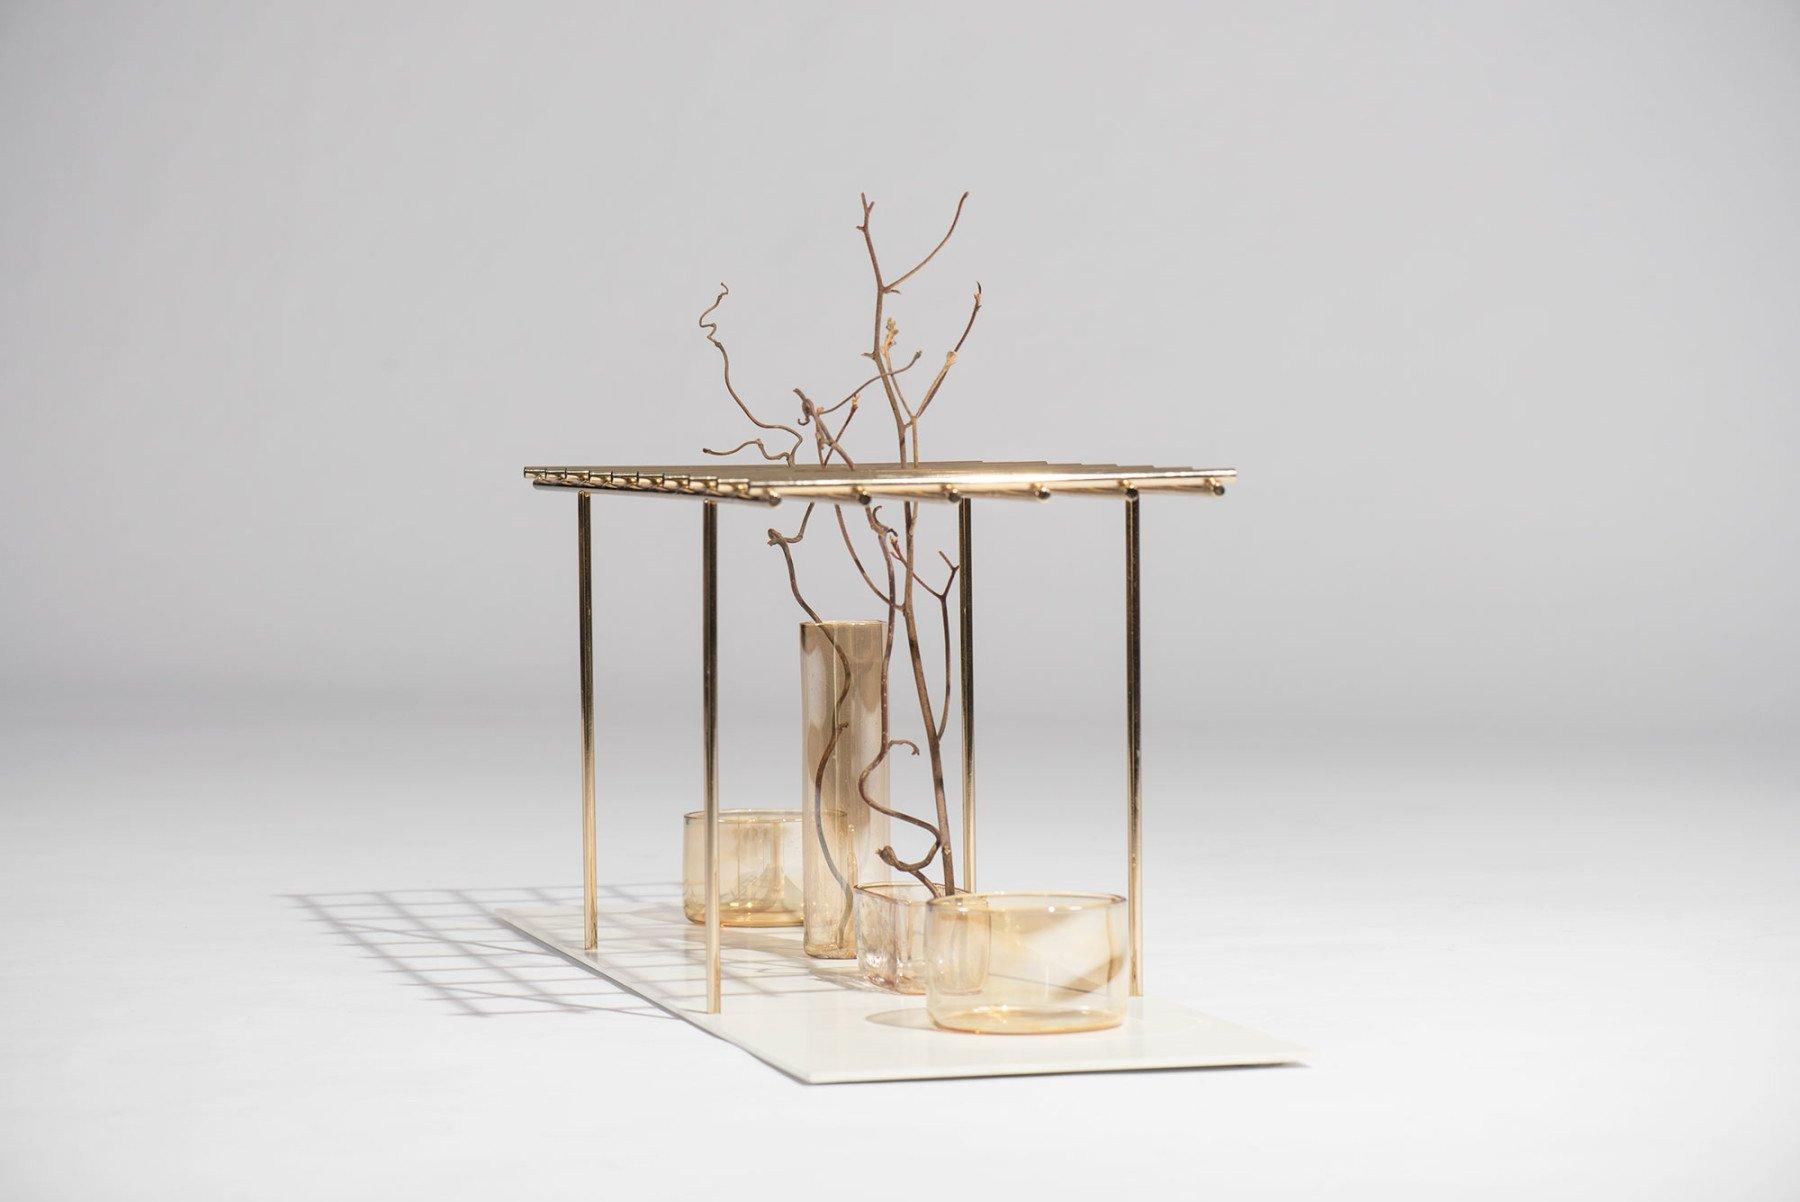 Andrea Branzi |   Golden Gate - centerpiece, flower vase